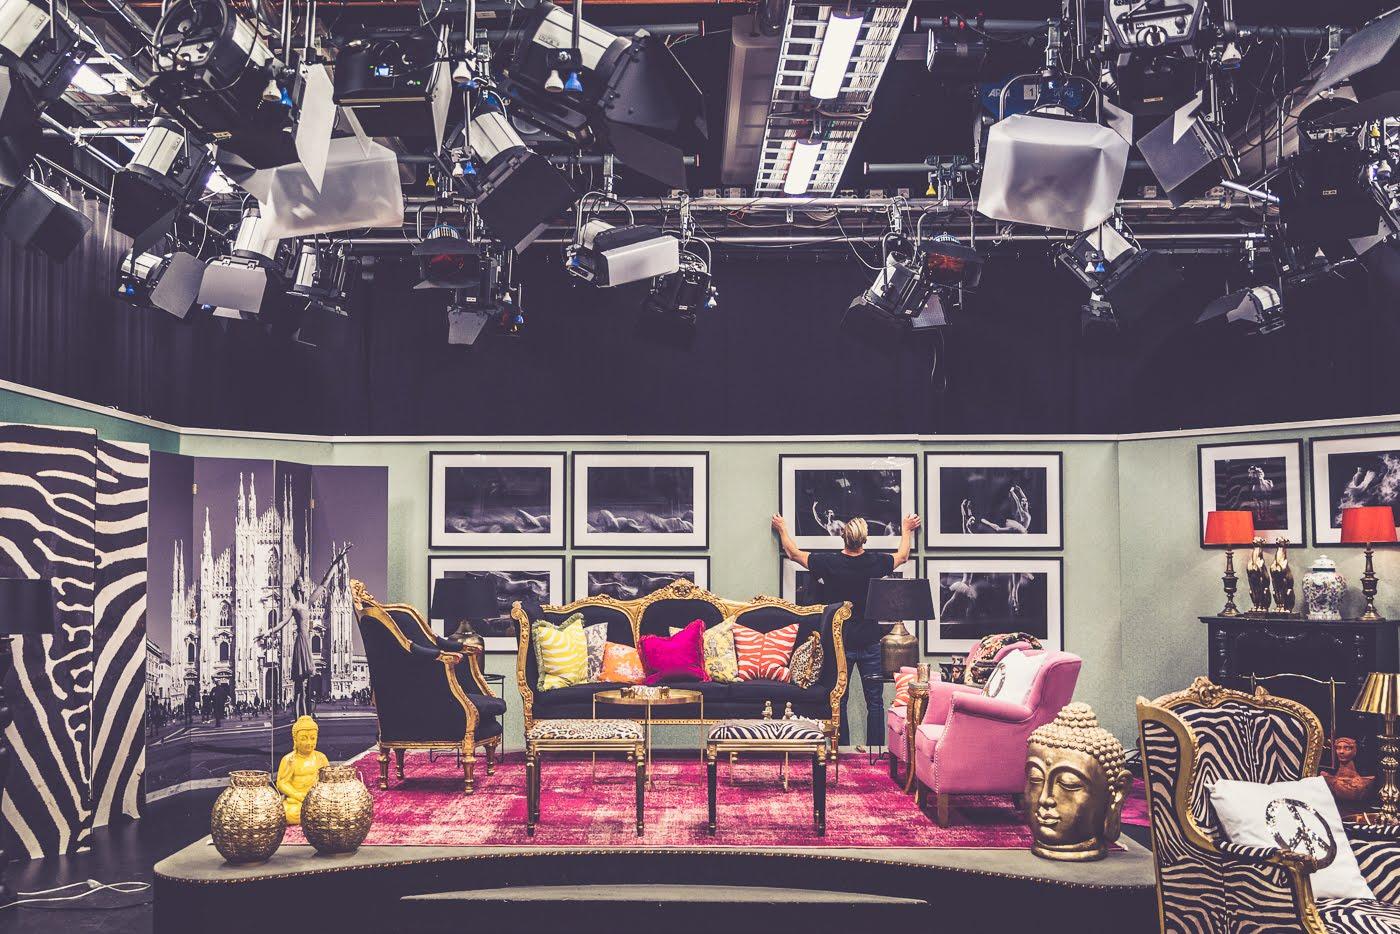 Tv 4 studio